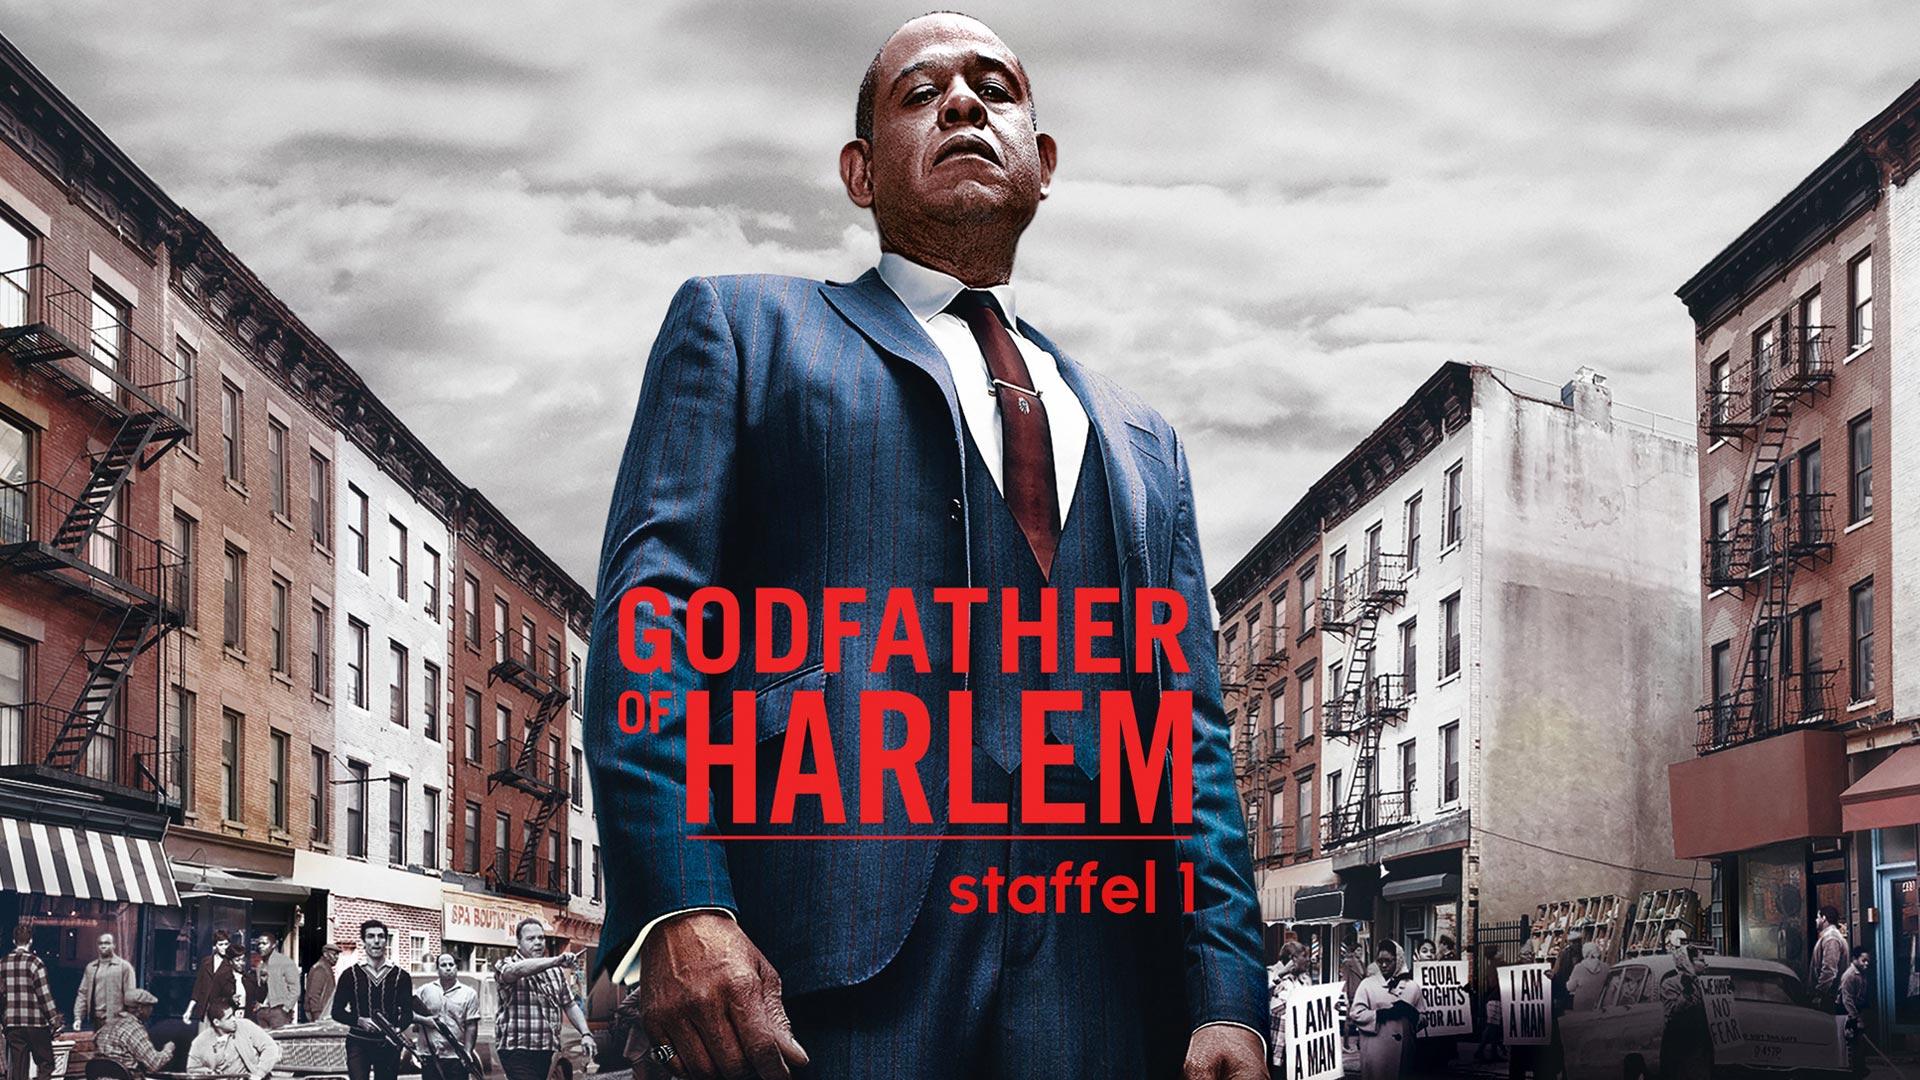 Godfather of Harlem, Staffel 1